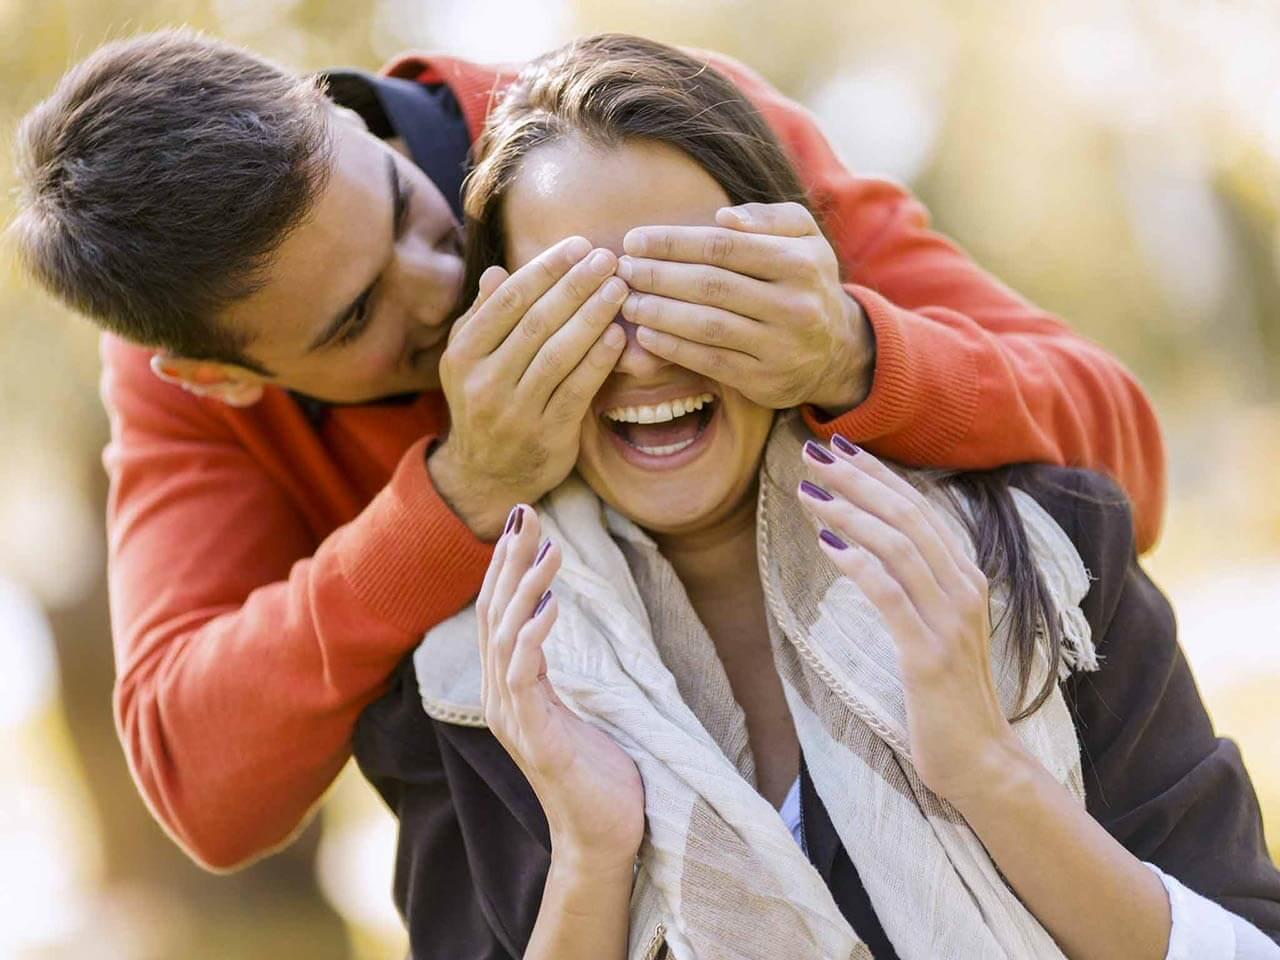 Couple revealing a suprise